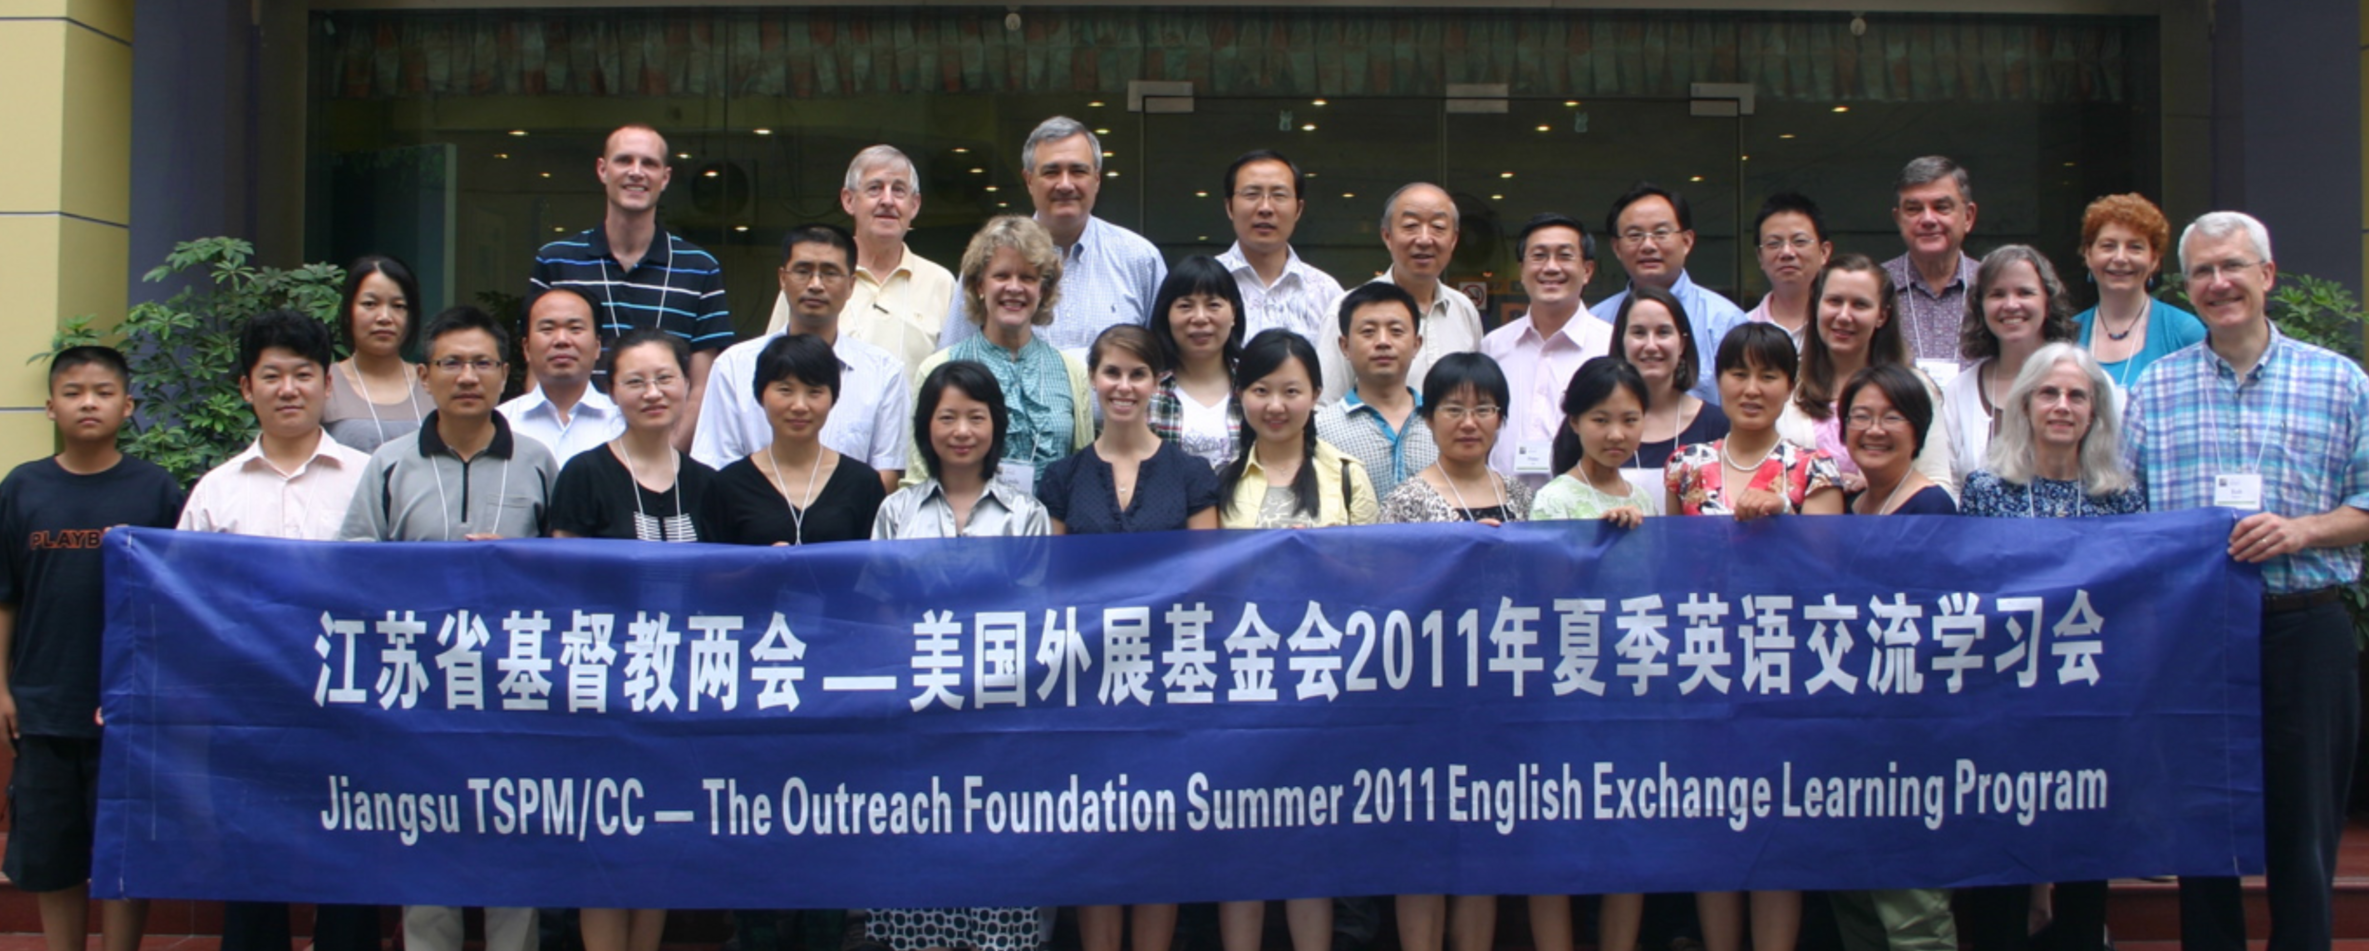 2011 China English Exchange